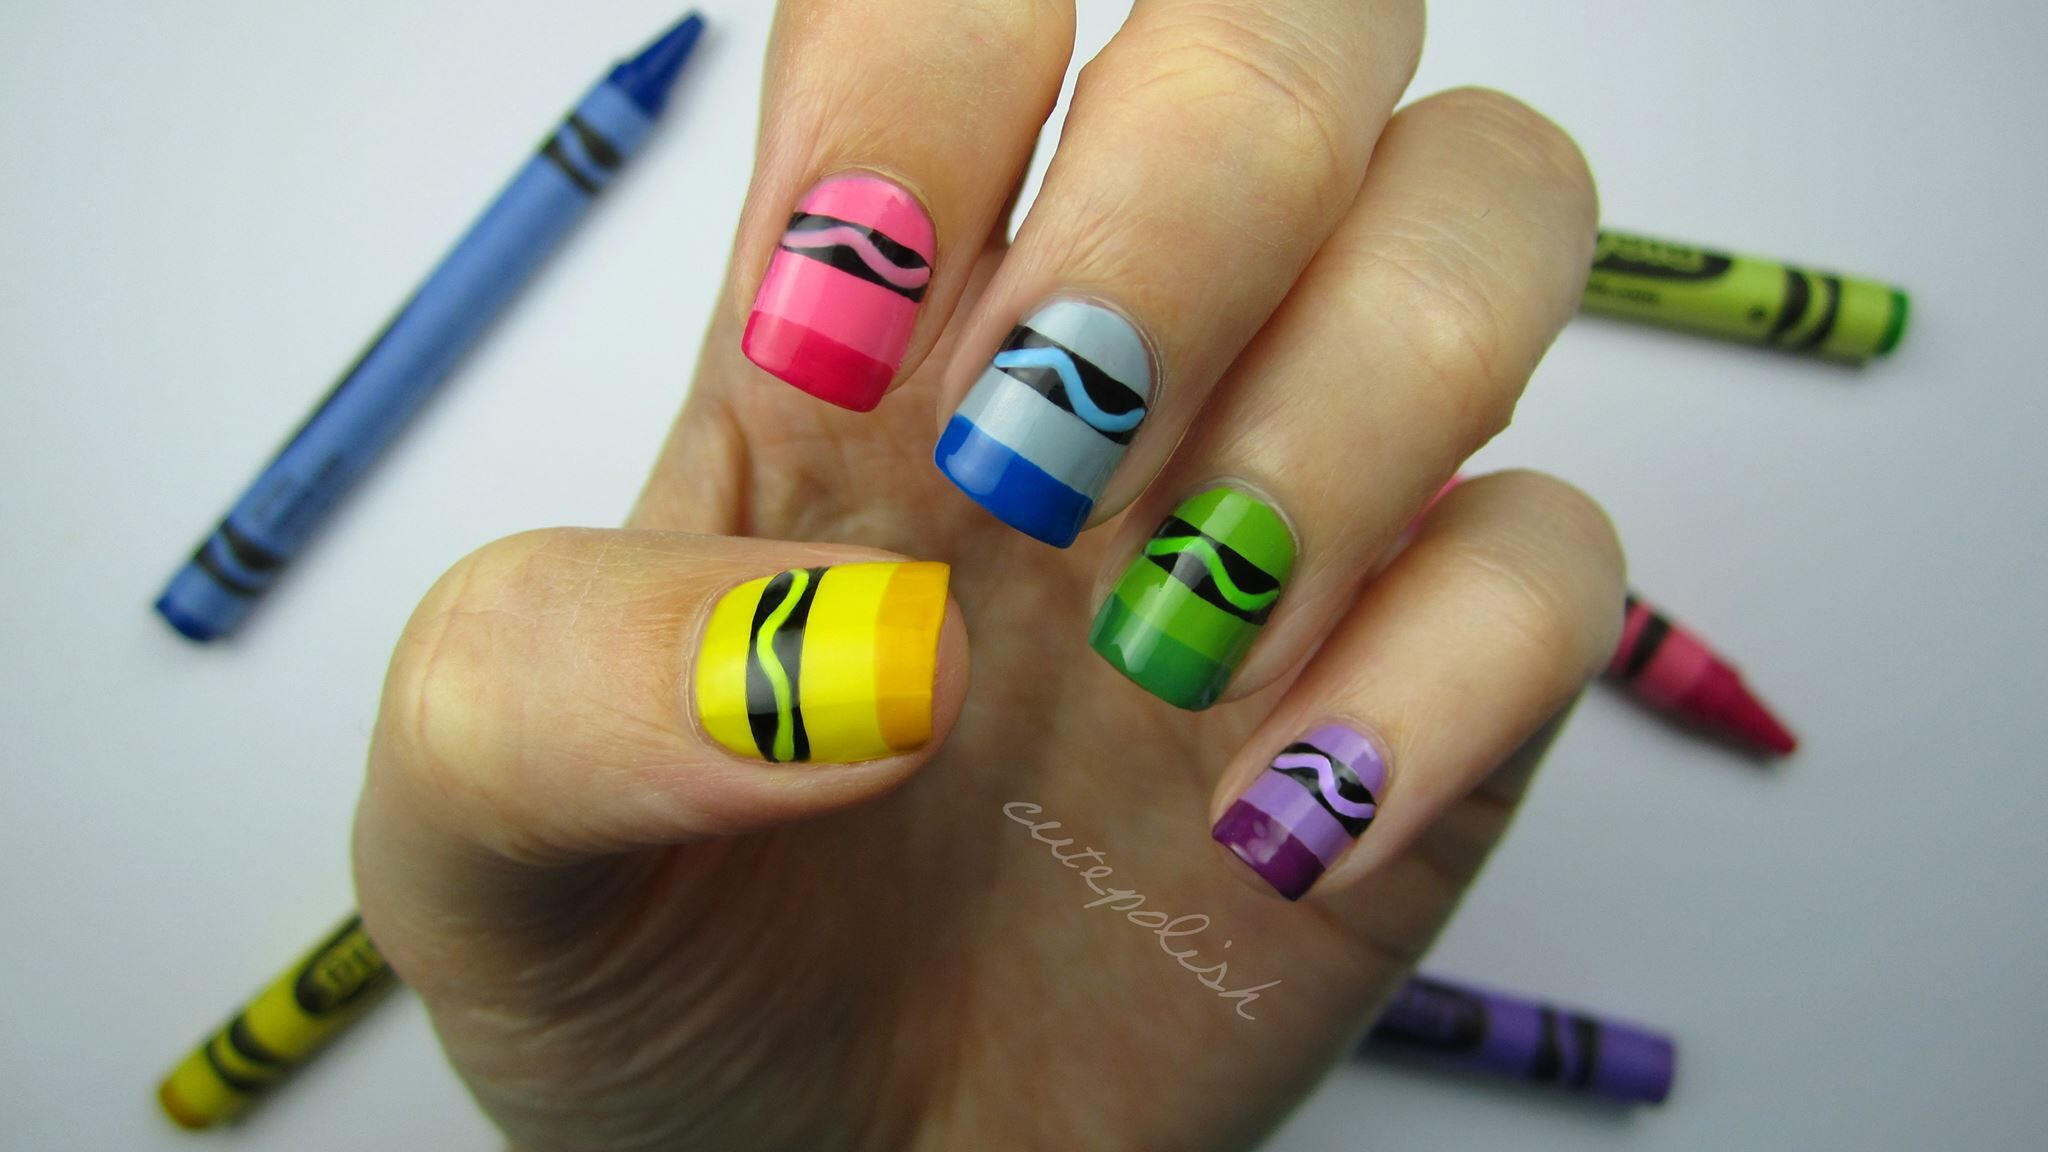 Crayon nails youtubewatchvudeniricpqkwusnsudem get